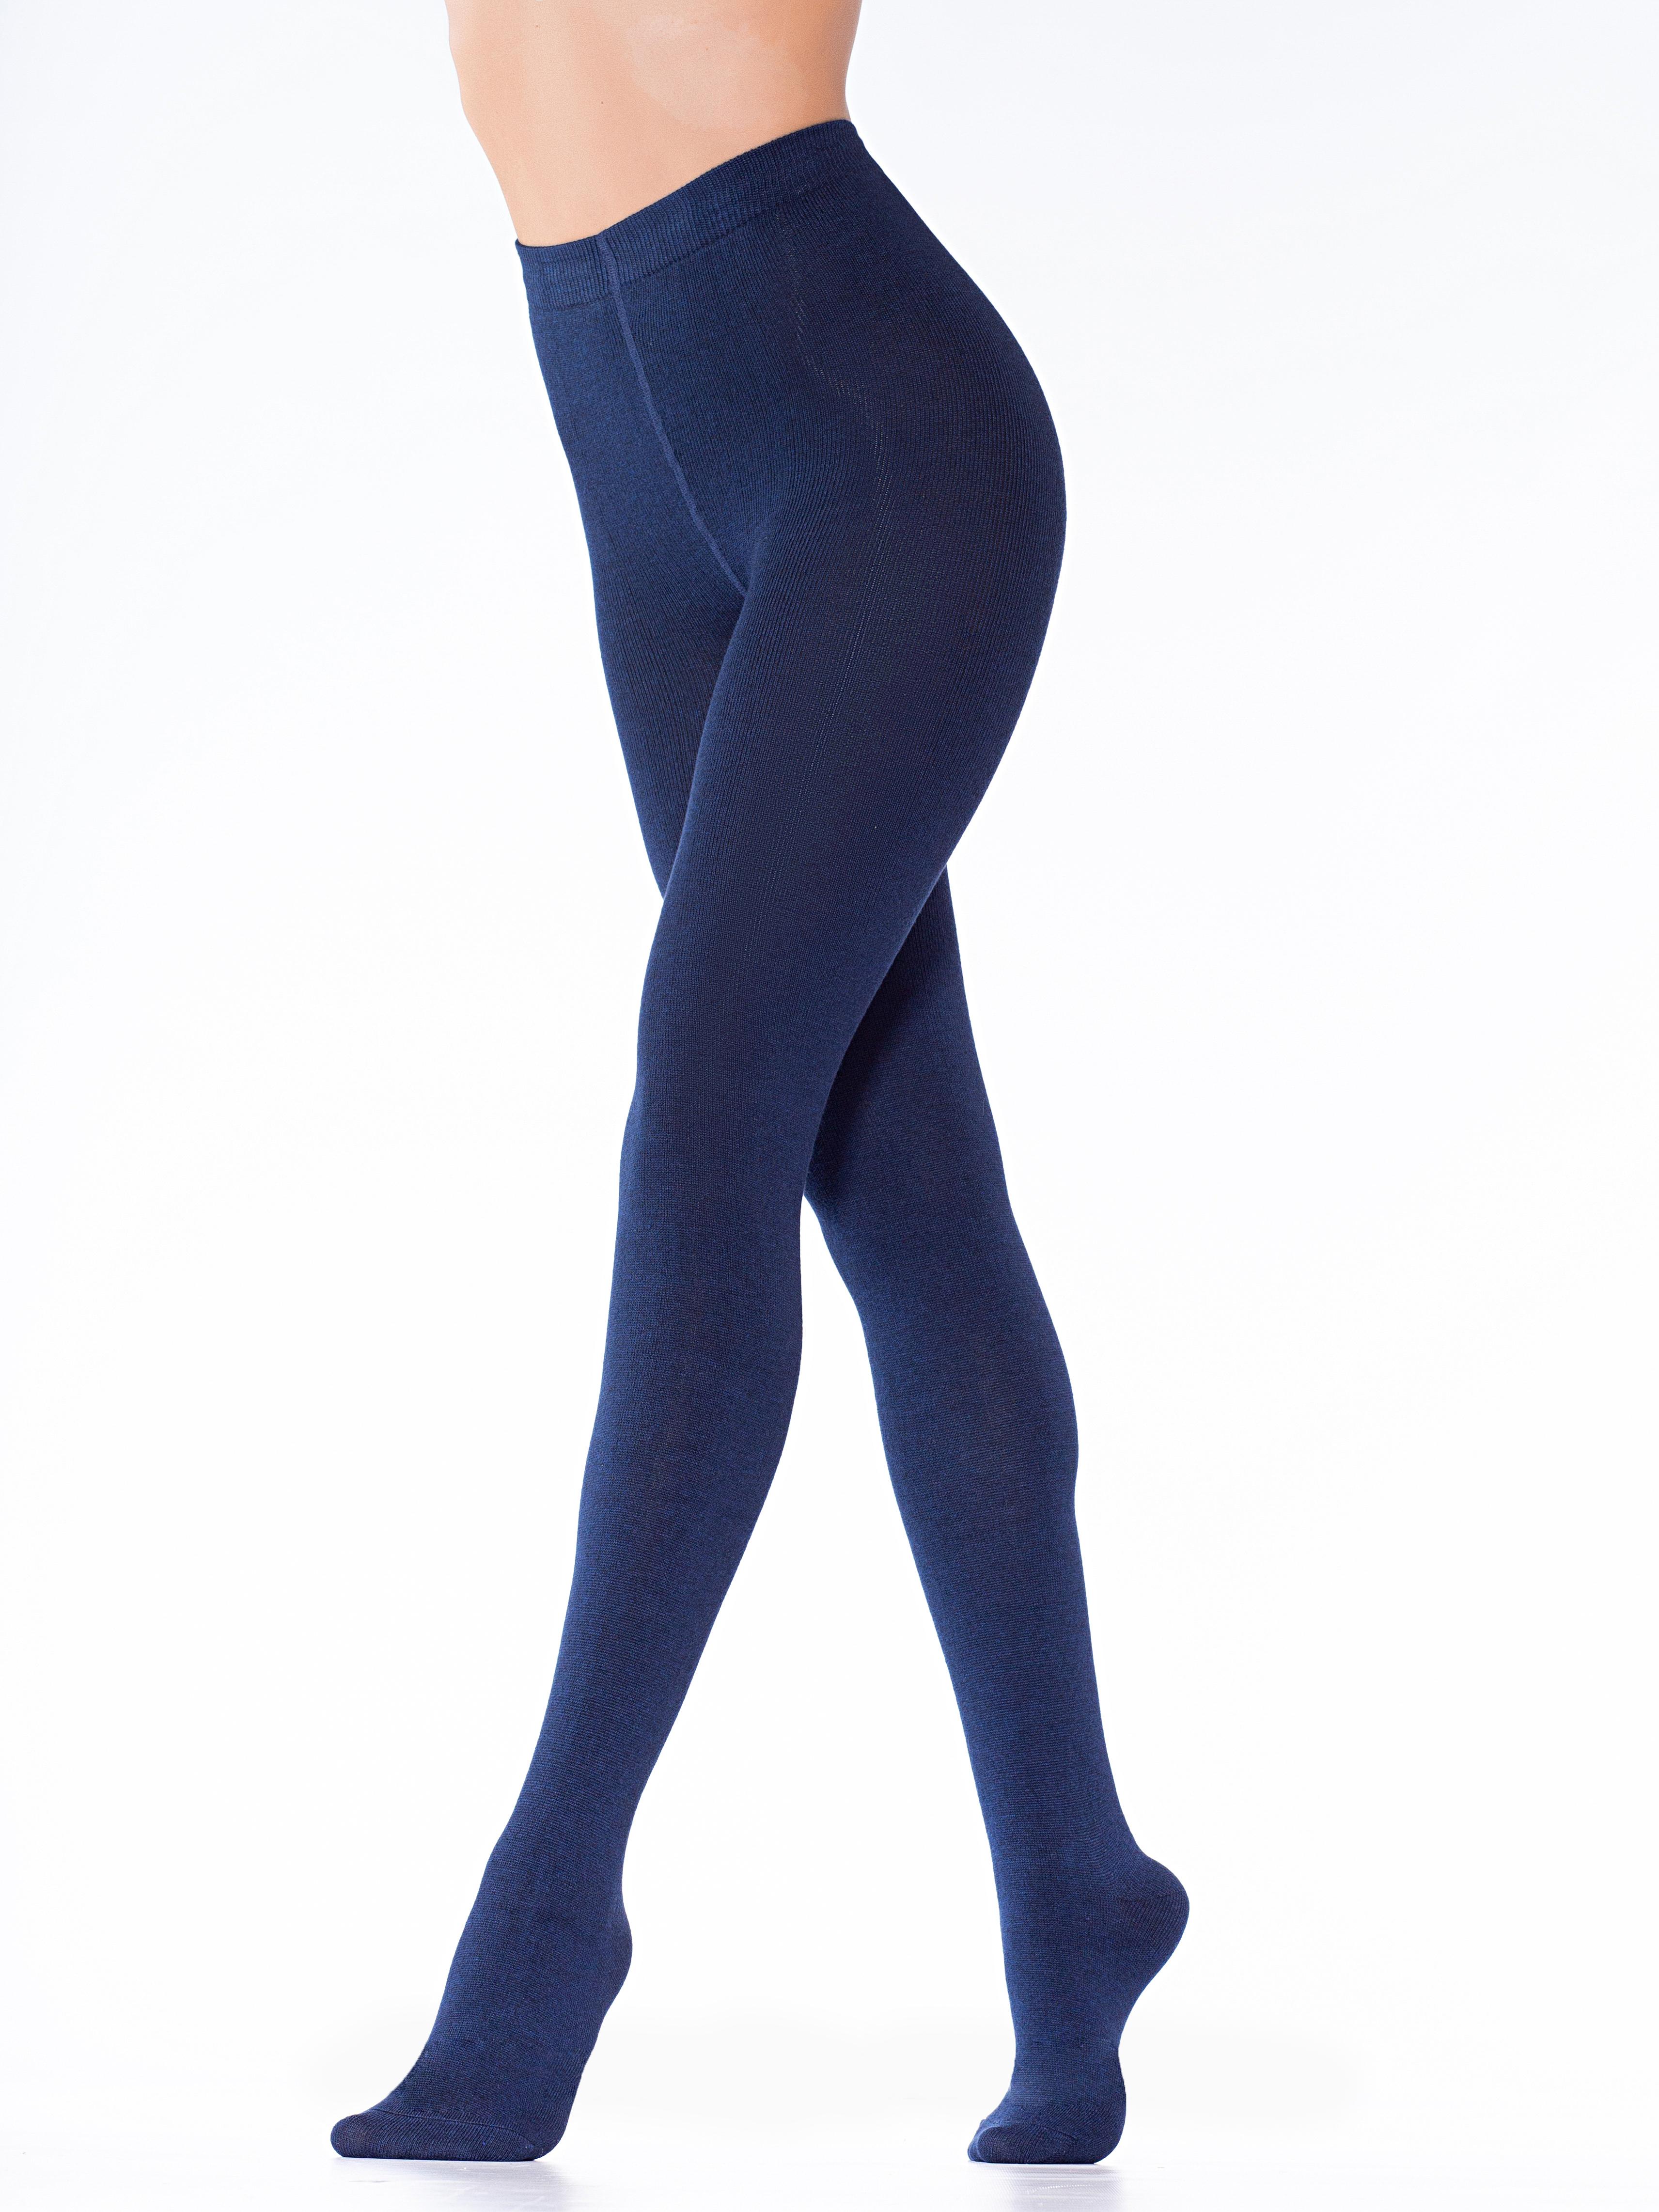 Колготки женские MiNiMi NOVITA 380 синие 3 (M) фото